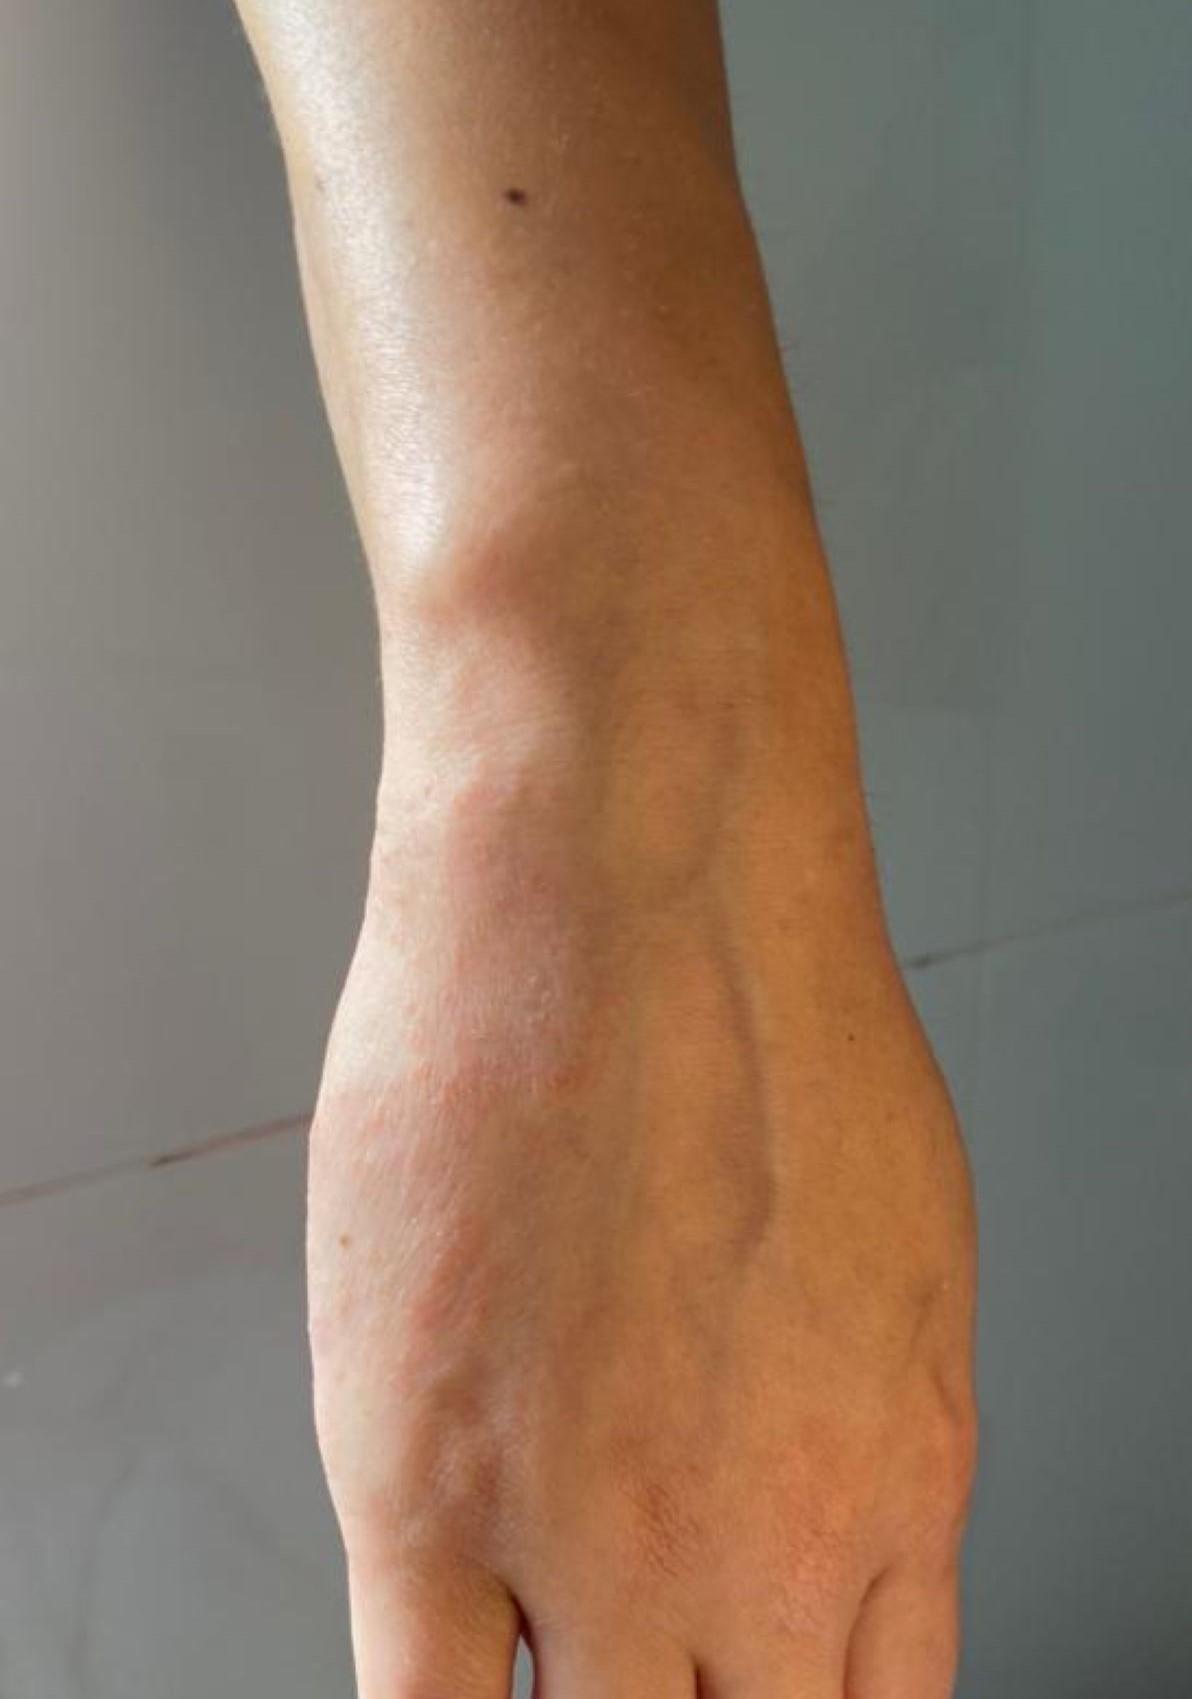 natuurlijke huidverzorging eczeem